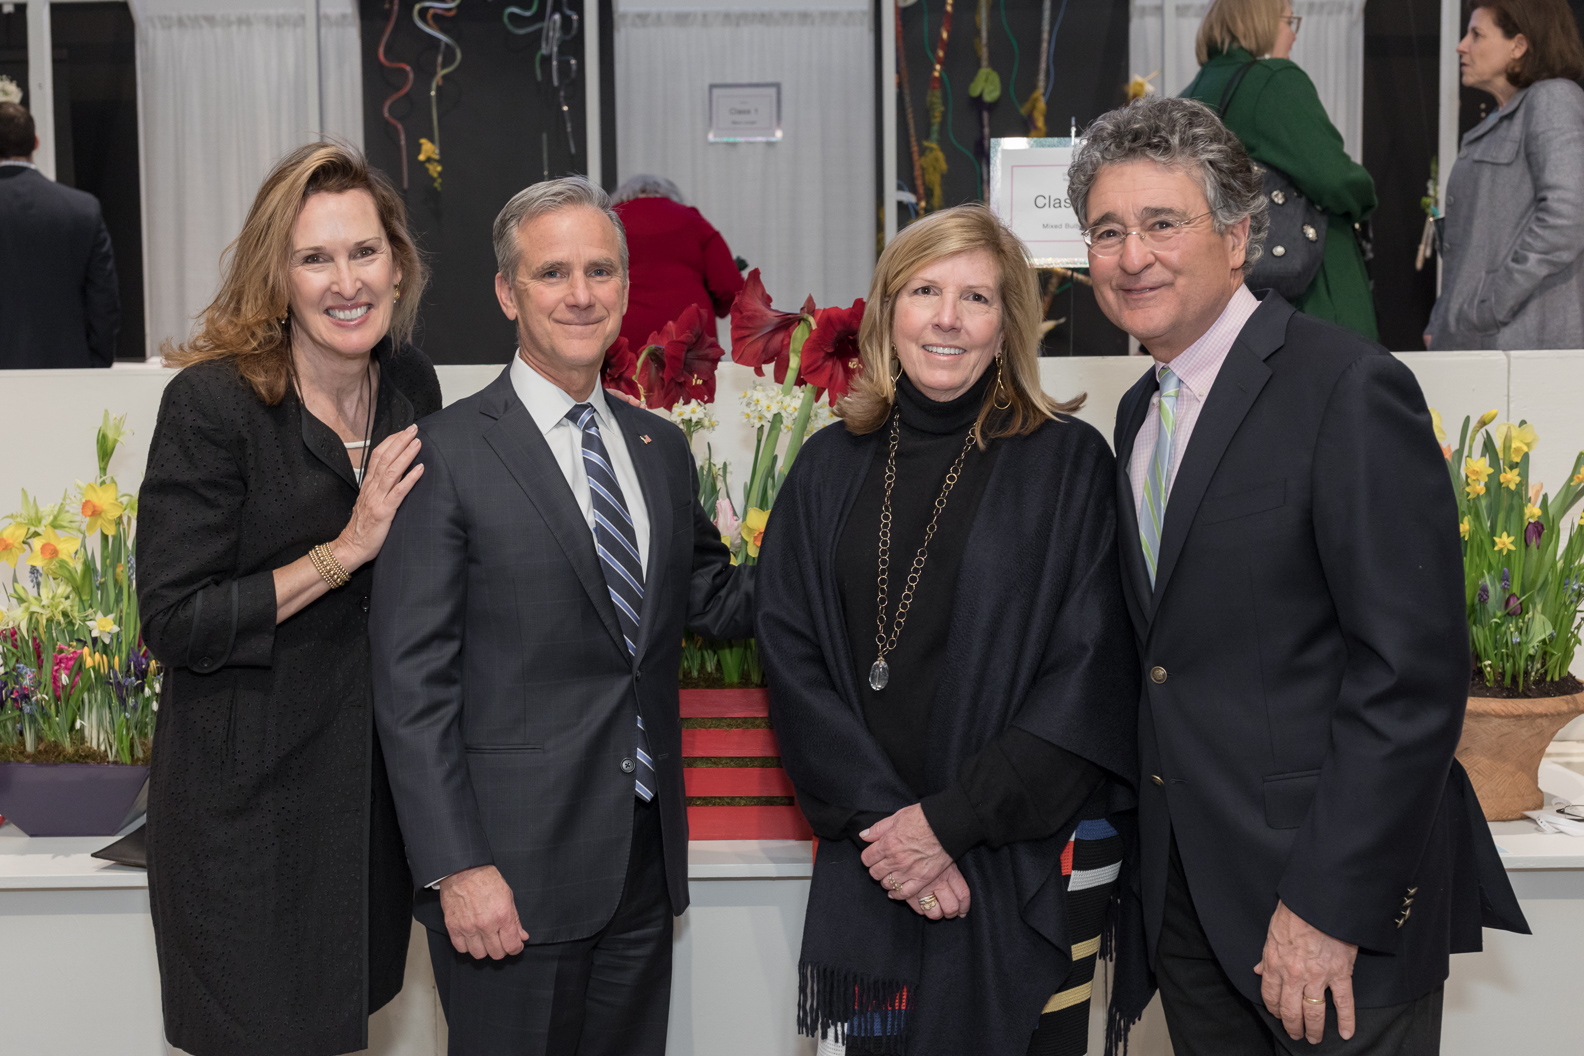 Eileen Grasso, Peter and Sheri Donovan, Patrick Grasso